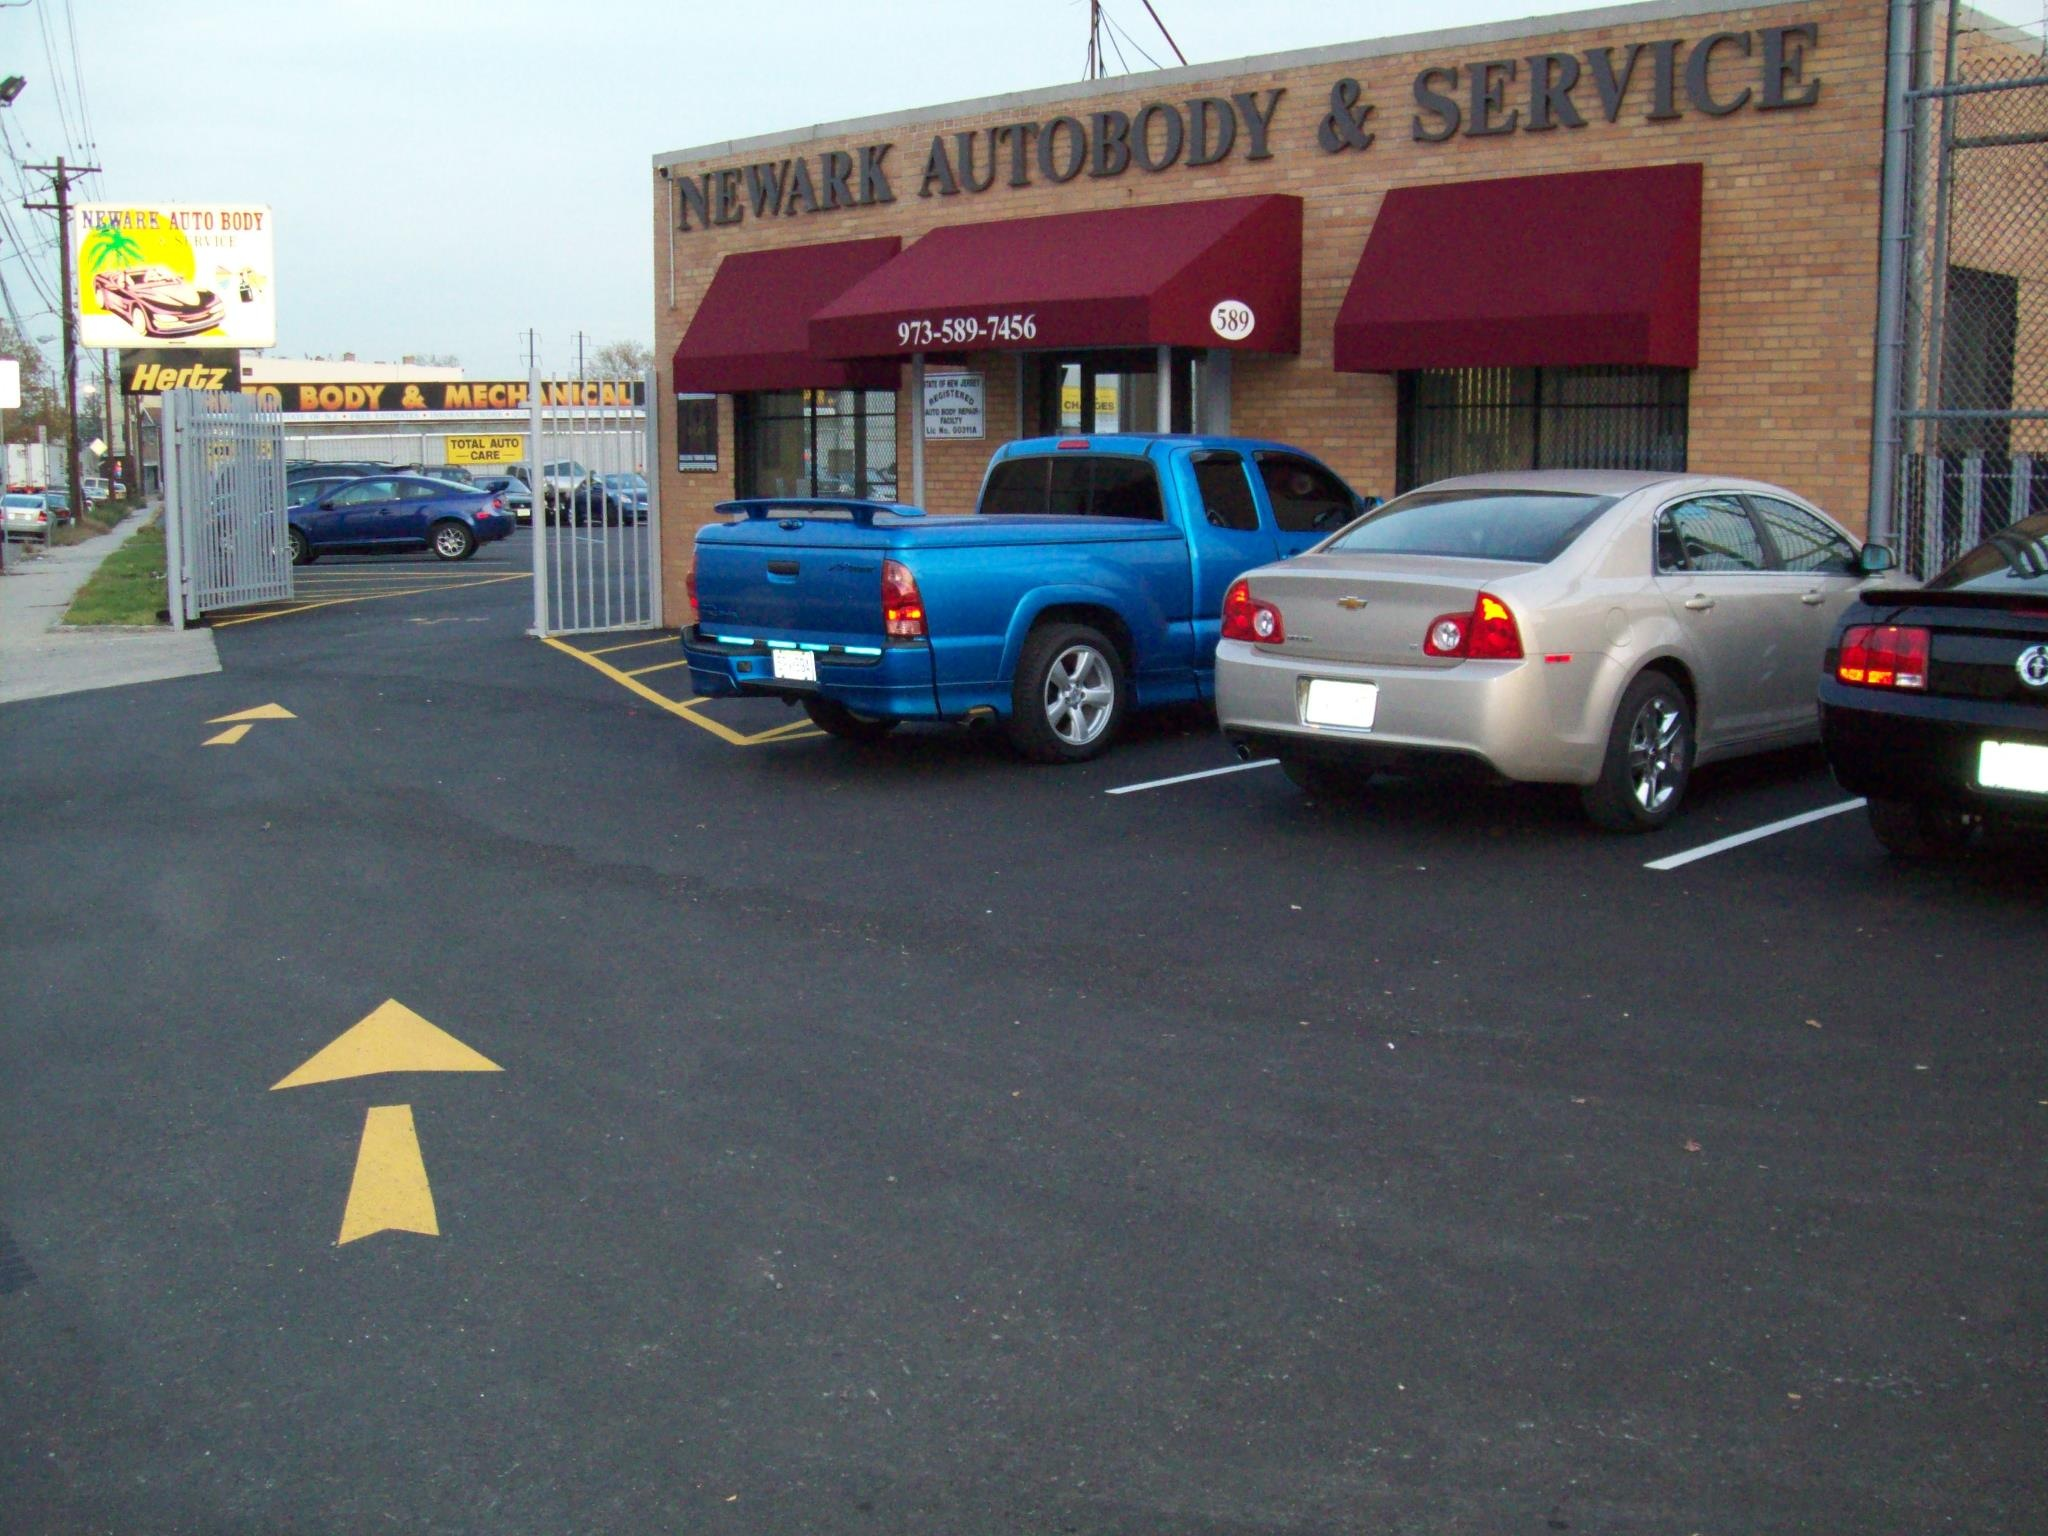 Newark Auto Body and Service